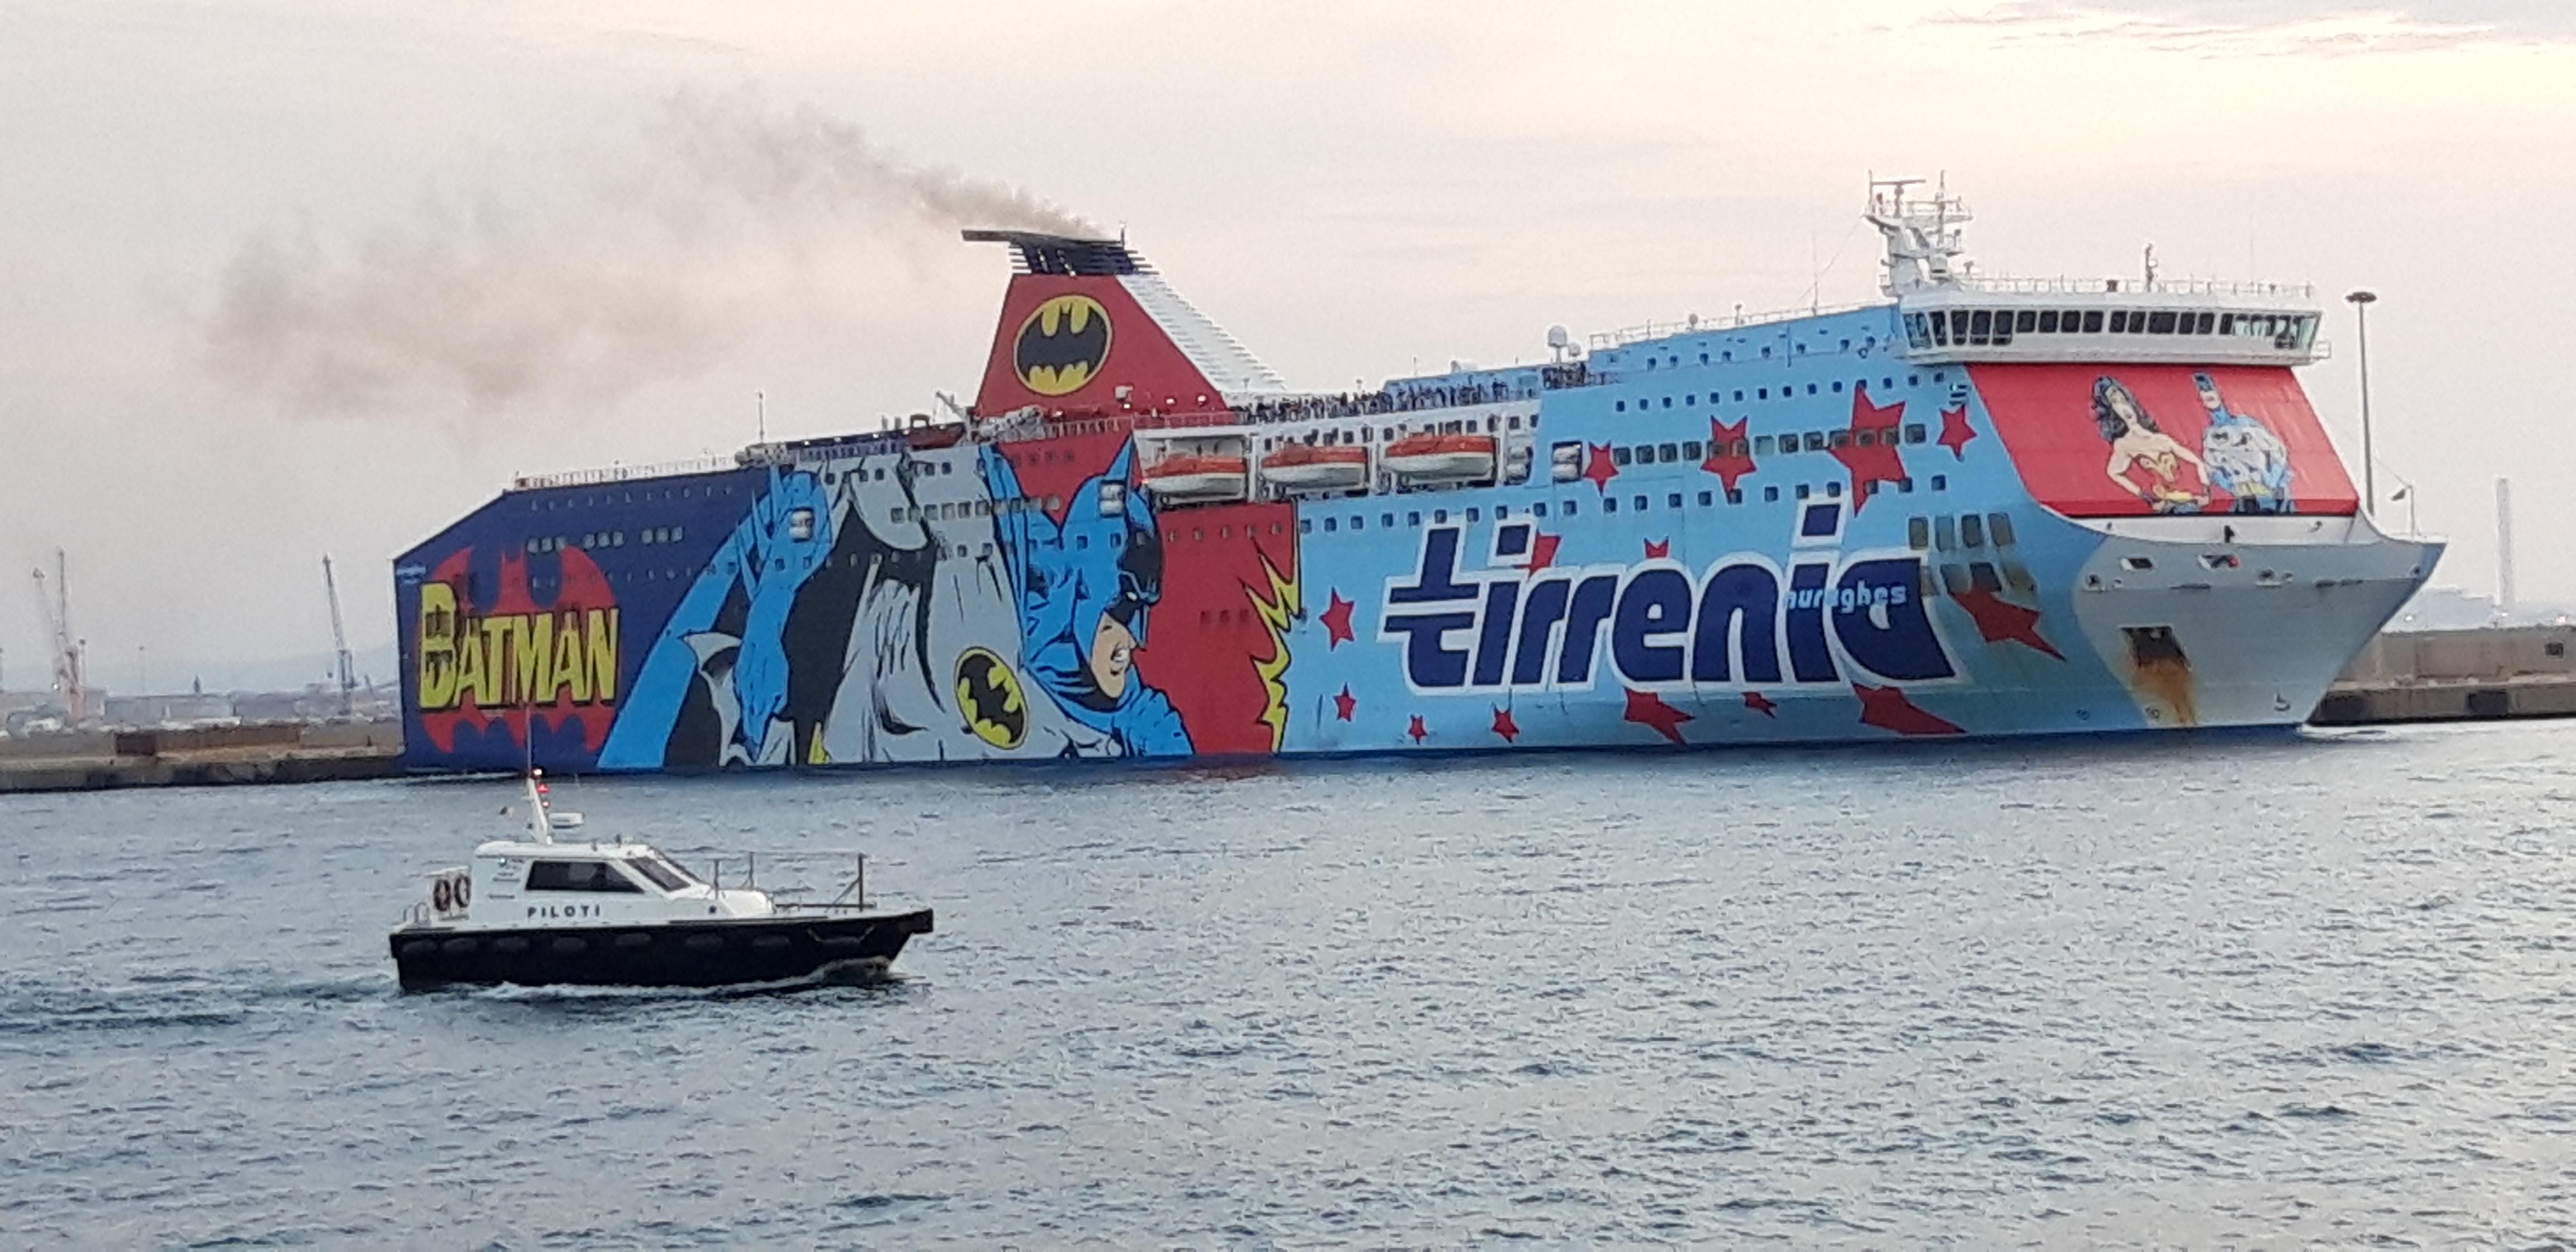 Nuraghes in uscita da Porto Torres (Video)